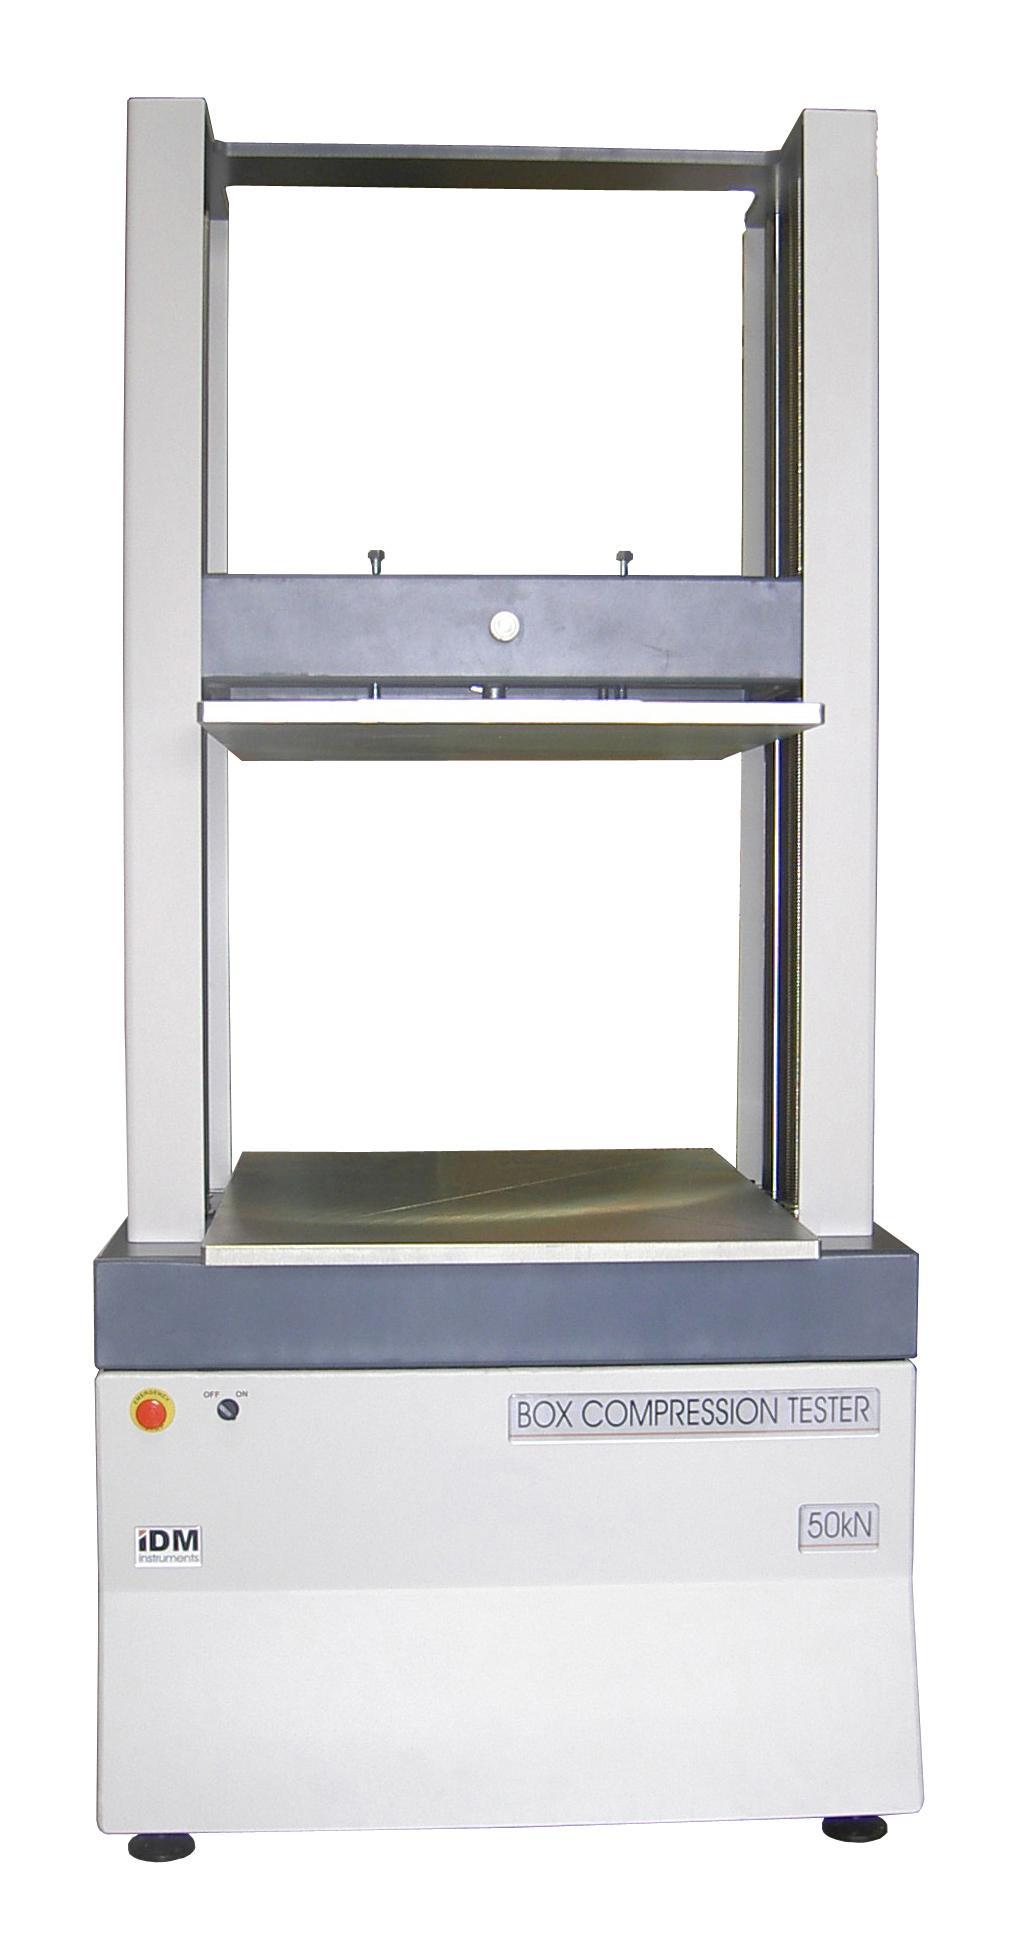 B0009 - ਬਾਕਸ ਕੰਪਰੈਸ਼ਨ ਟੈਸਟਰ-50kN